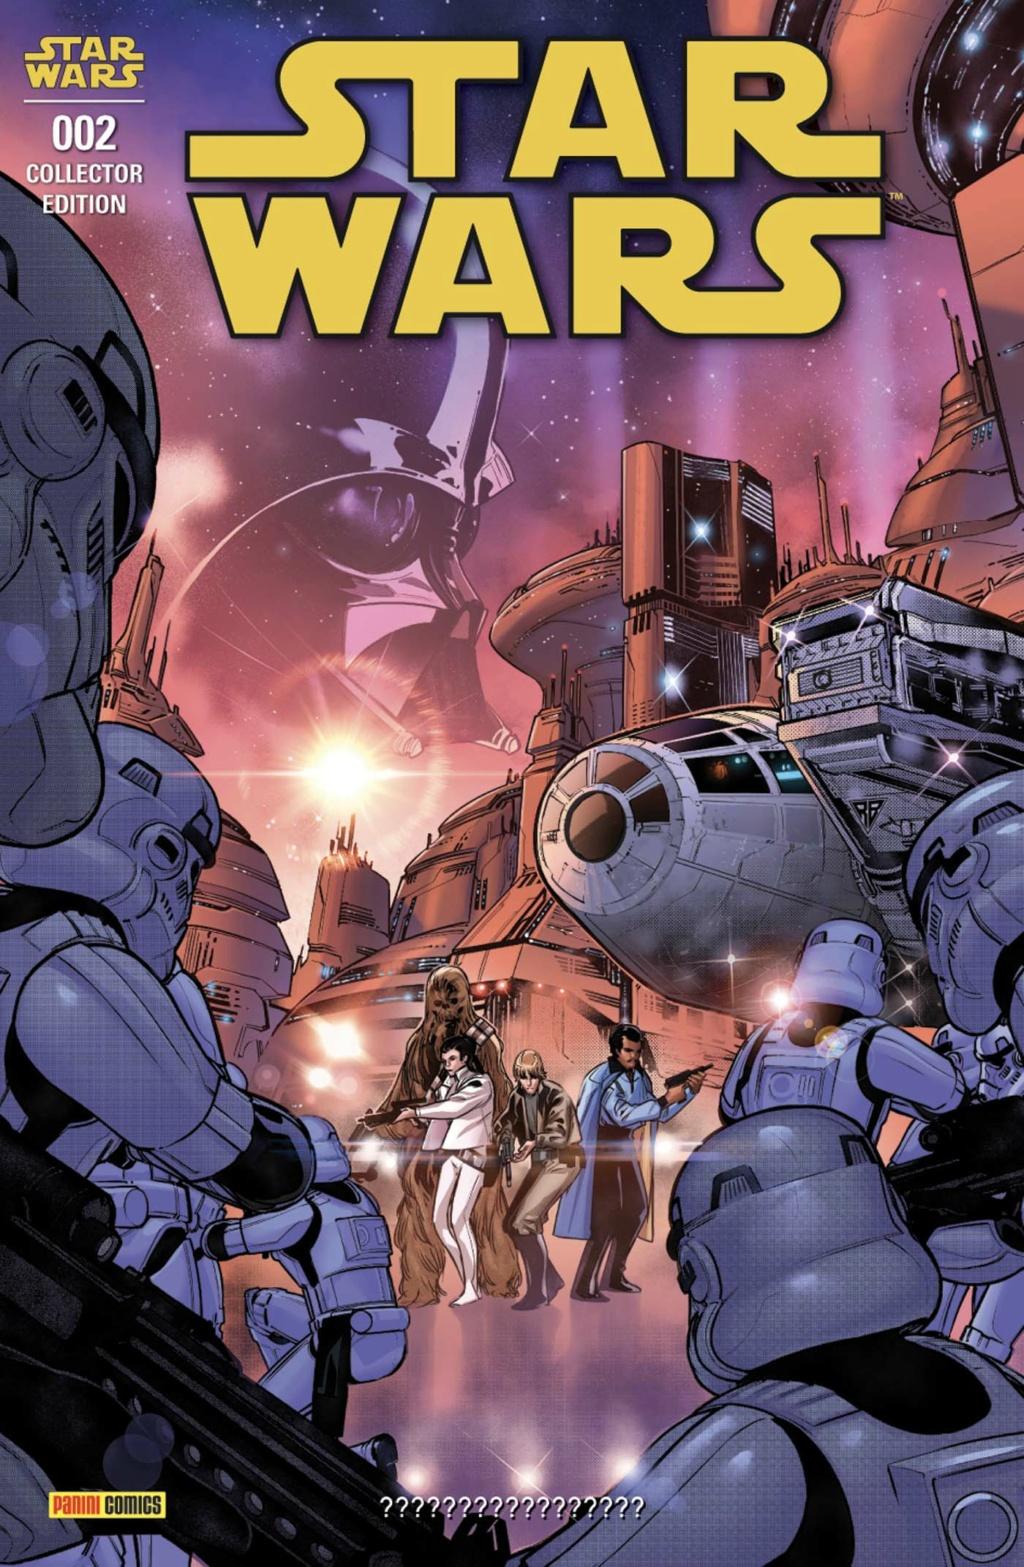 SOFTCOVER STAR WARS #02 V5 (43) PANINI - FEVRIER 2021 02b10